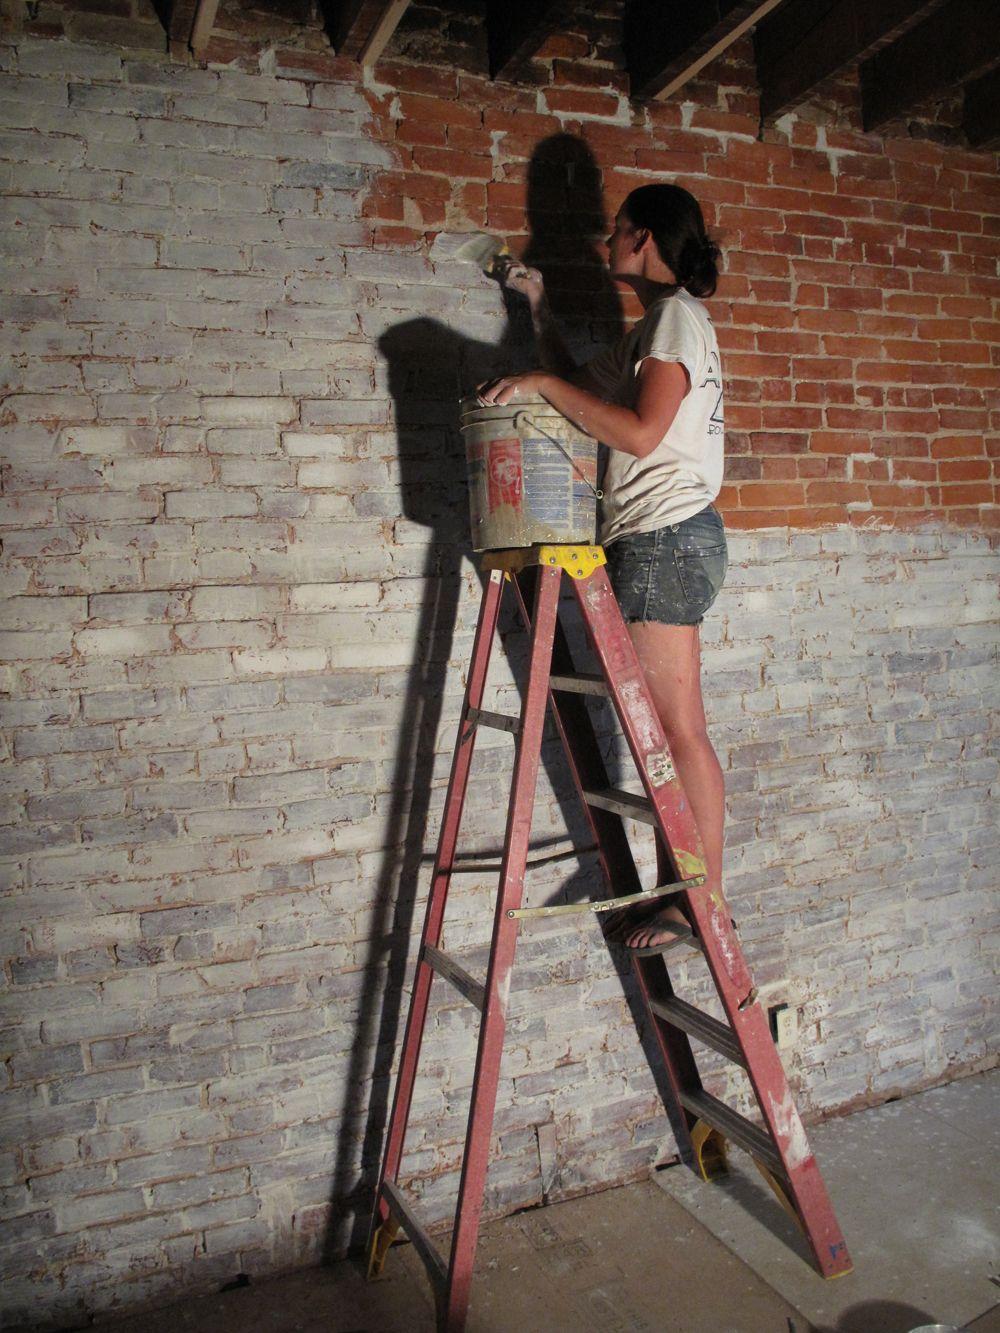 How To Whitewash Brick White Wash Brick Painted Brick Walls Diy Brick Wall